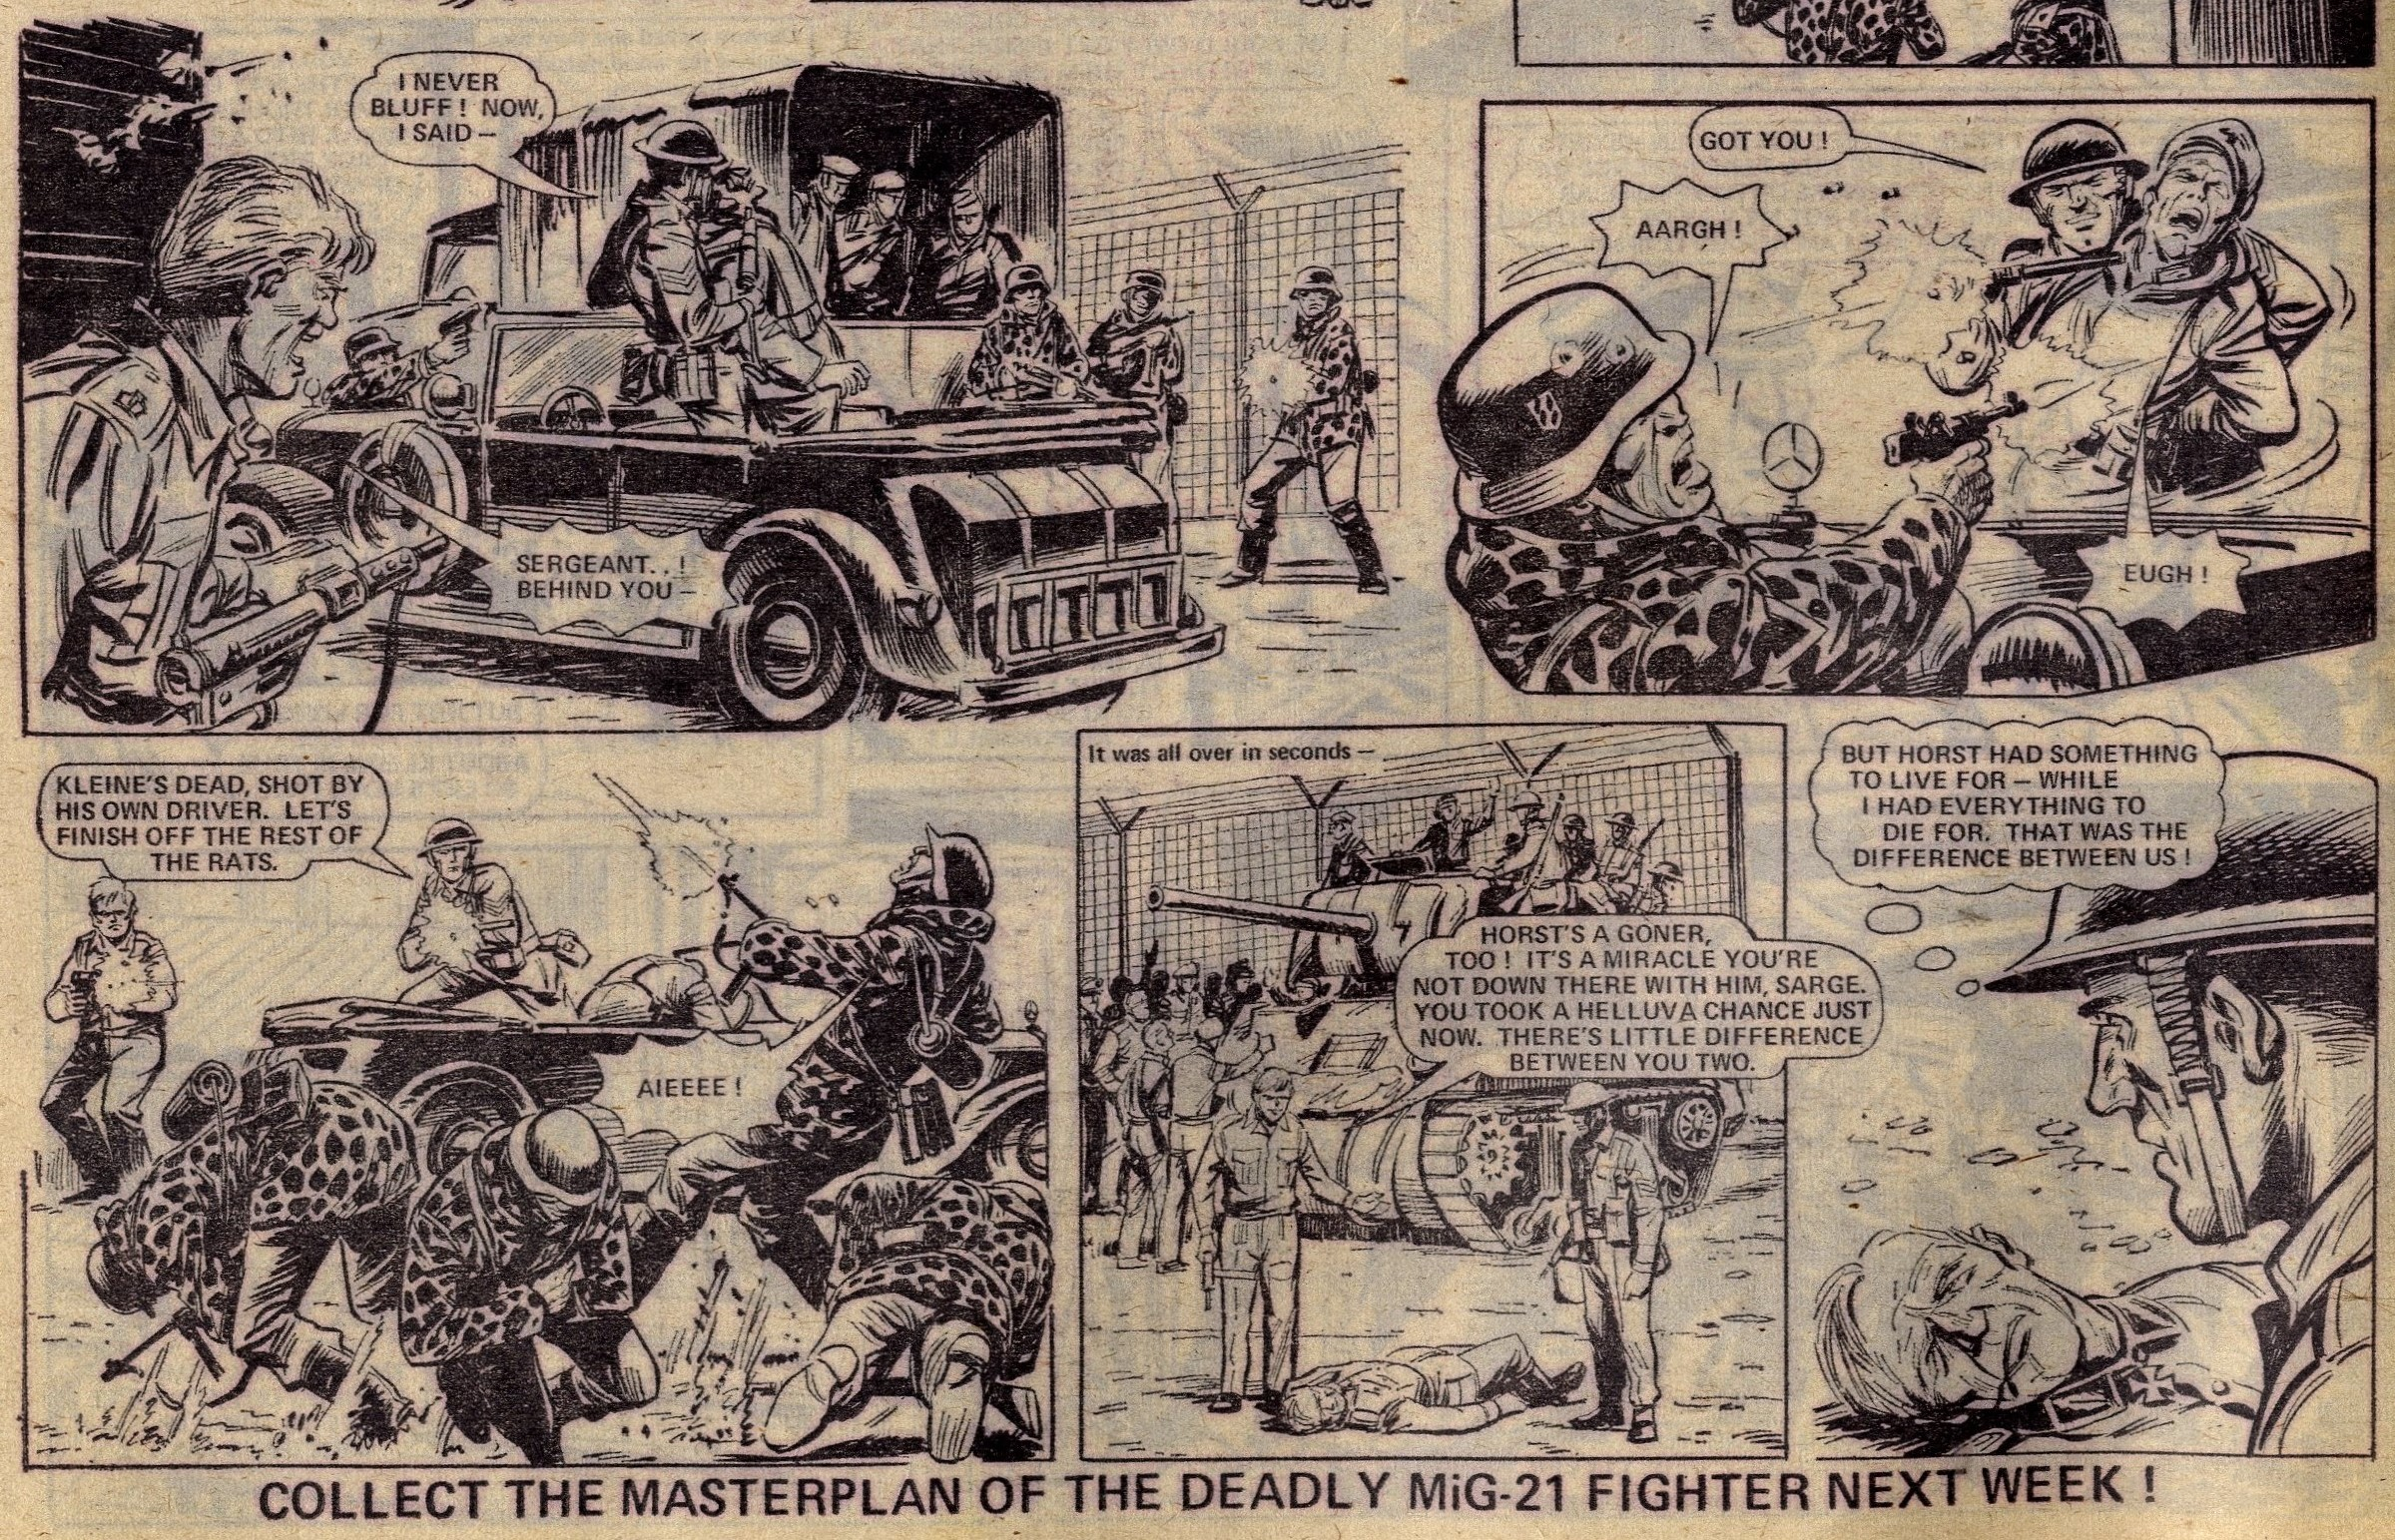 D-Day Dawson: Gerry Finley-Day (writer), Joe Colquhoun? (artist)